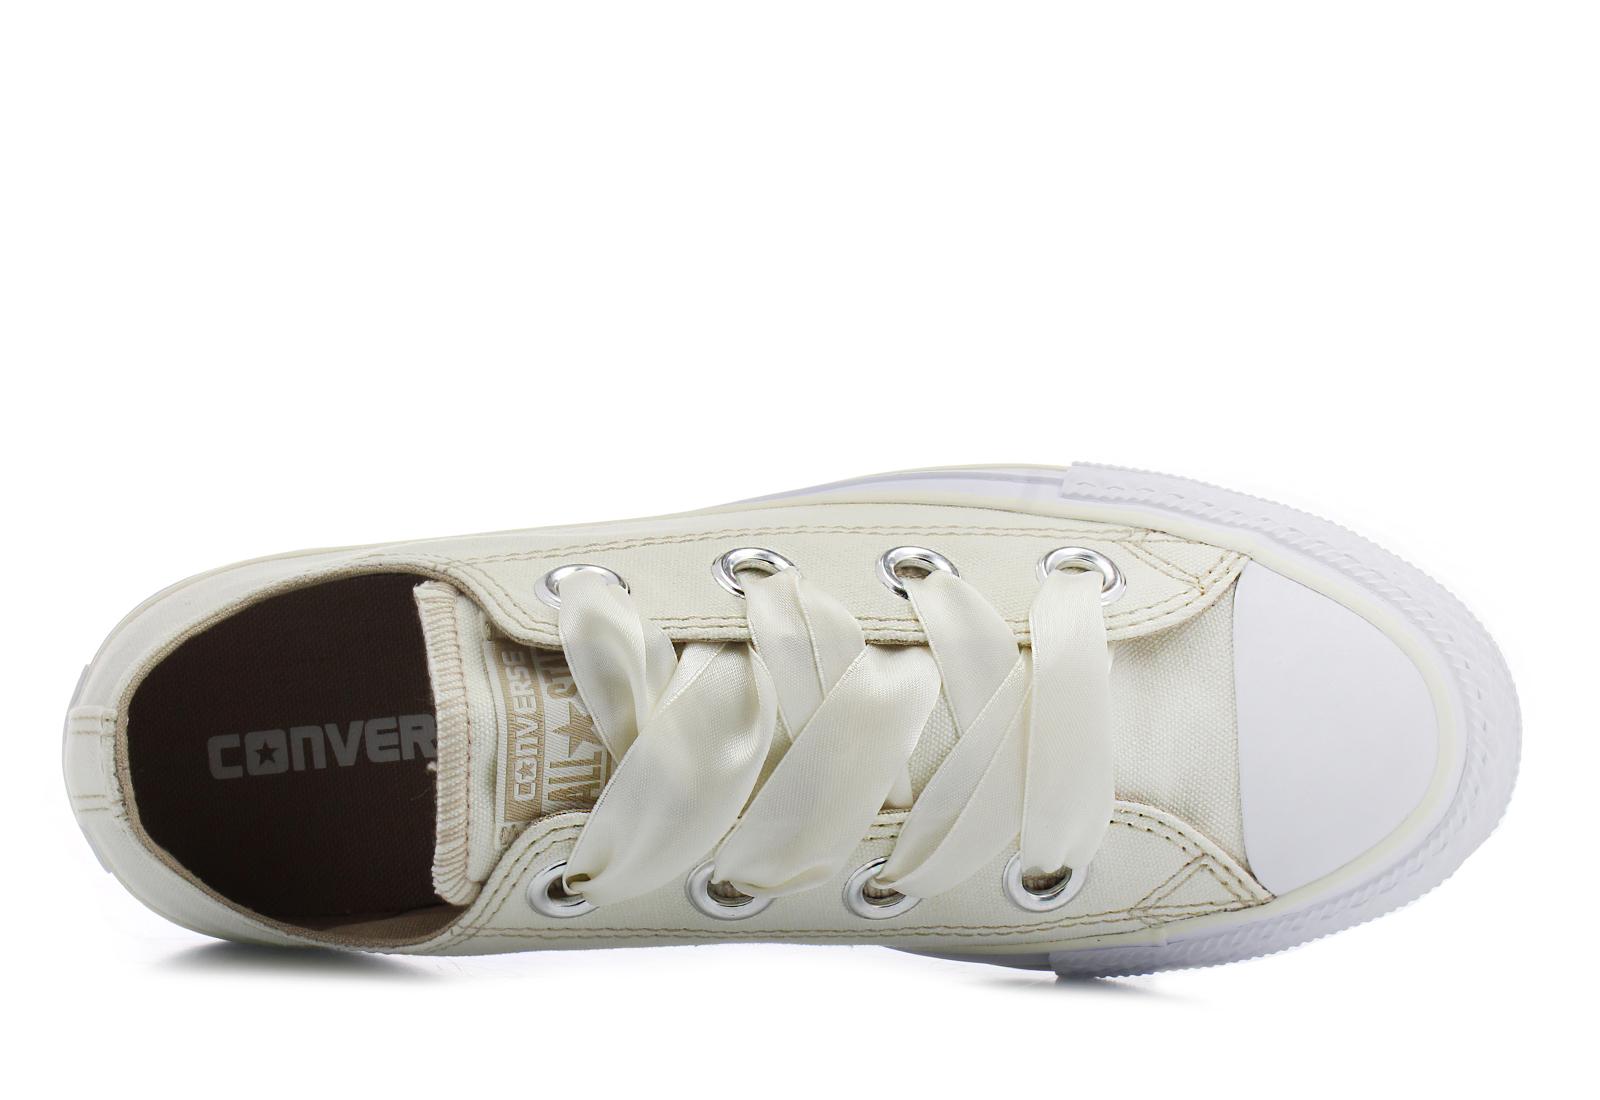 Converse Sneakers - Chuck Taylor All Star Big Eyelets - 559919C ... dbd849e3c40